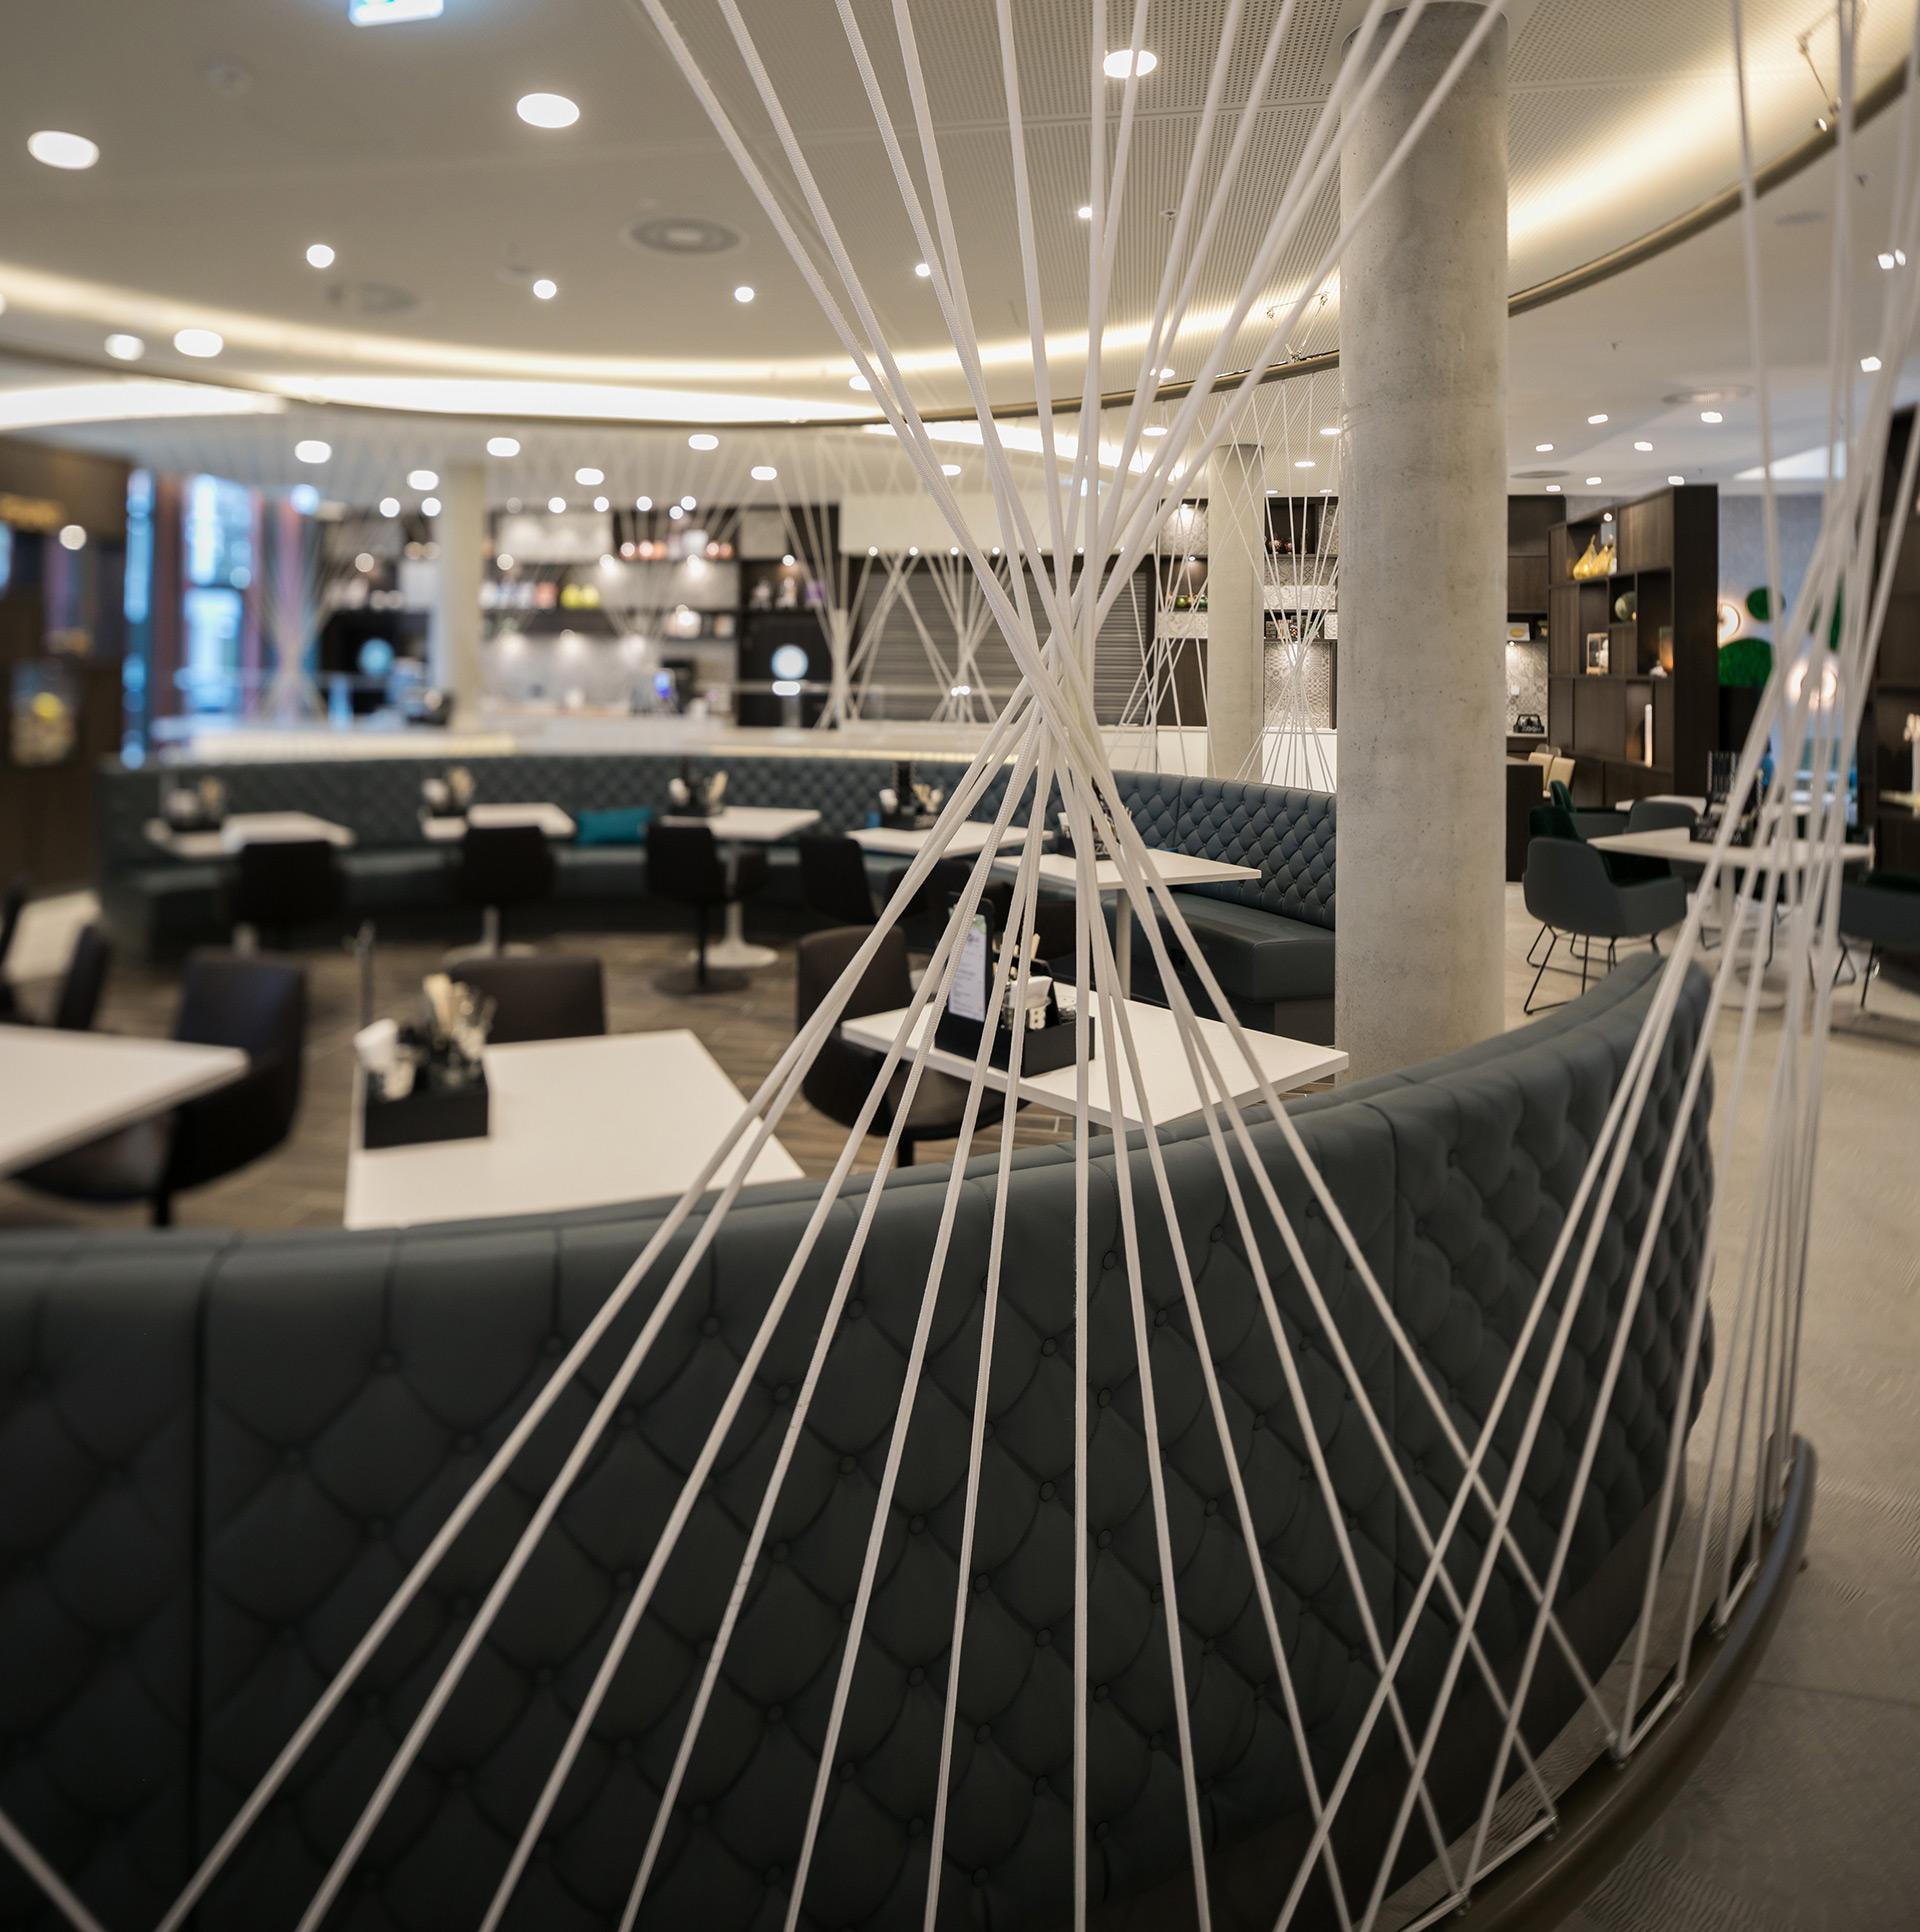 Hyatt place frankfurt joi design innenarchitektur interior design produktdesign - Innenarchitektur frankfurt ...